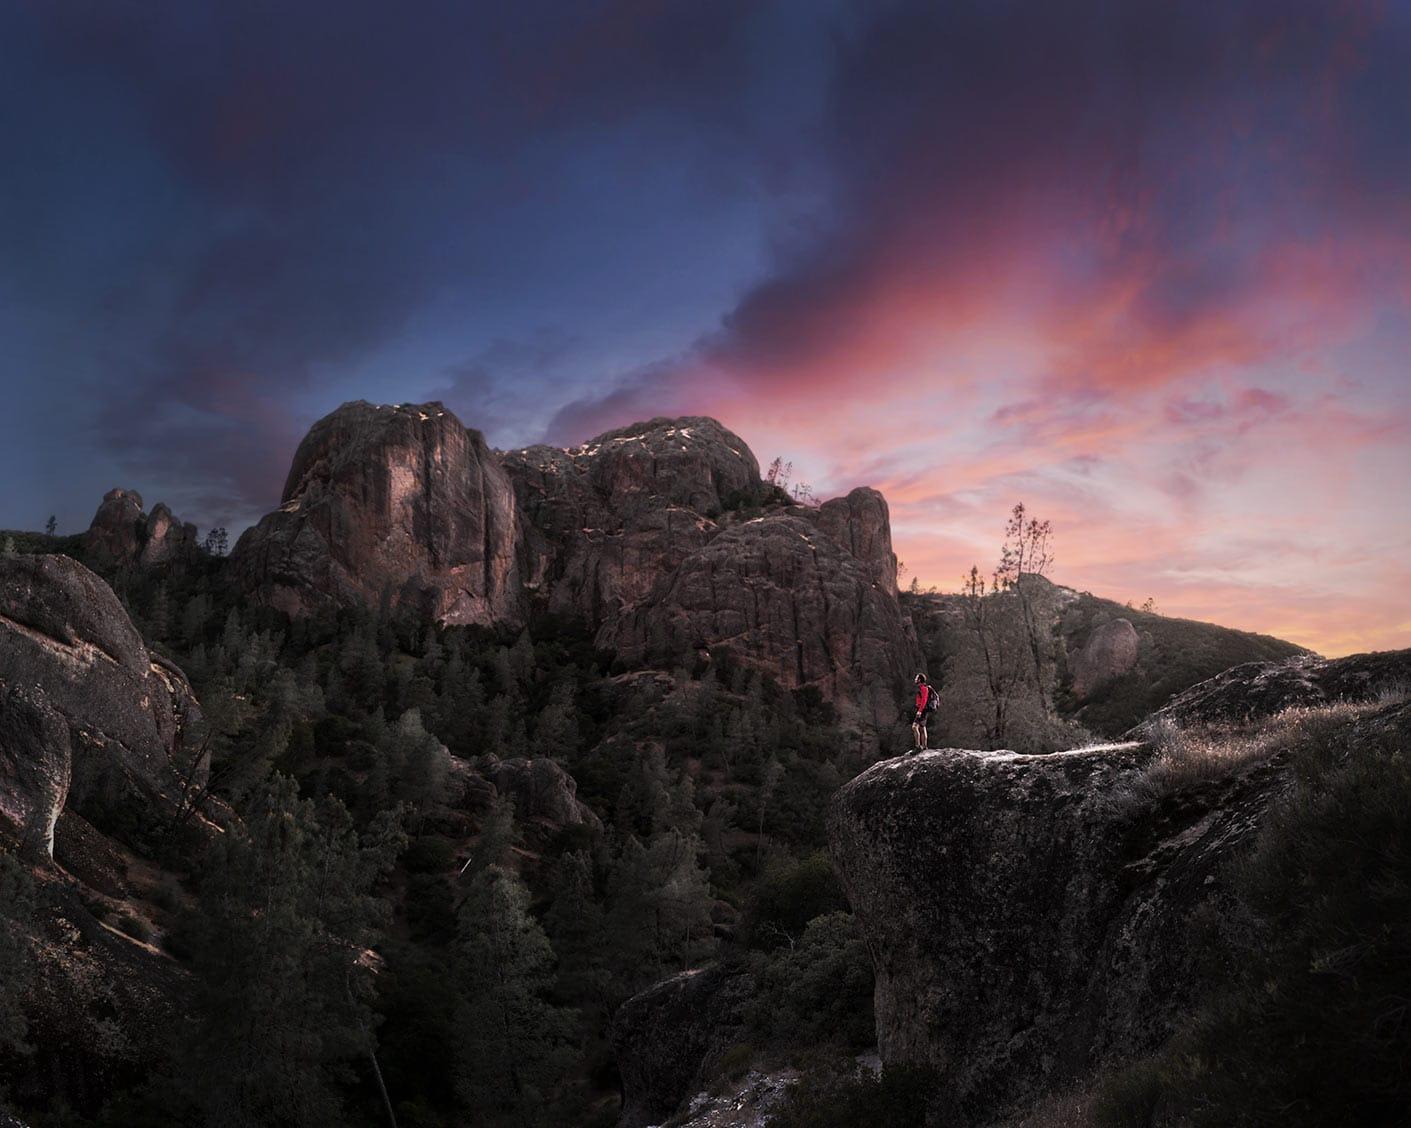 Hiker on Rocks Facing Left Faraway Shot Background Skies at Dusk